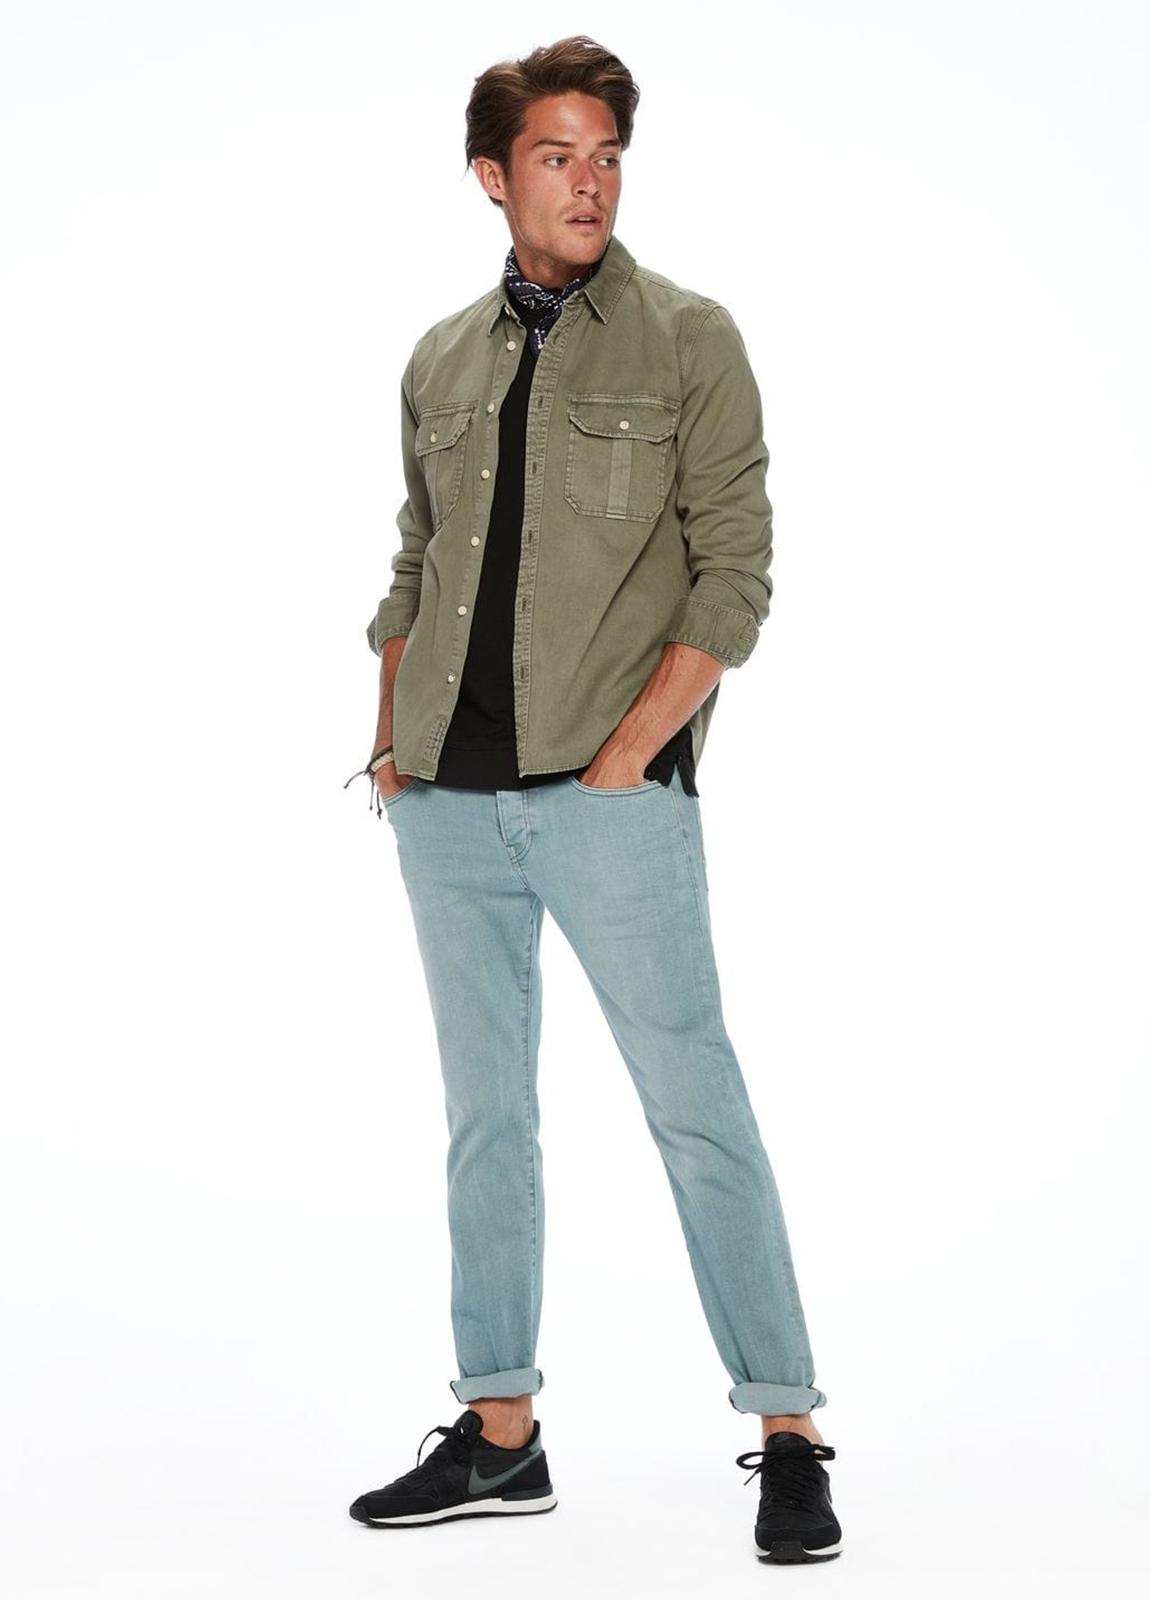 Pantalón 5 bolsillos regular slim fit modelo RALSTON denim elástico teñido en prenda color celeste. 78% Algodón 21% Poliéster 1% Elastano.